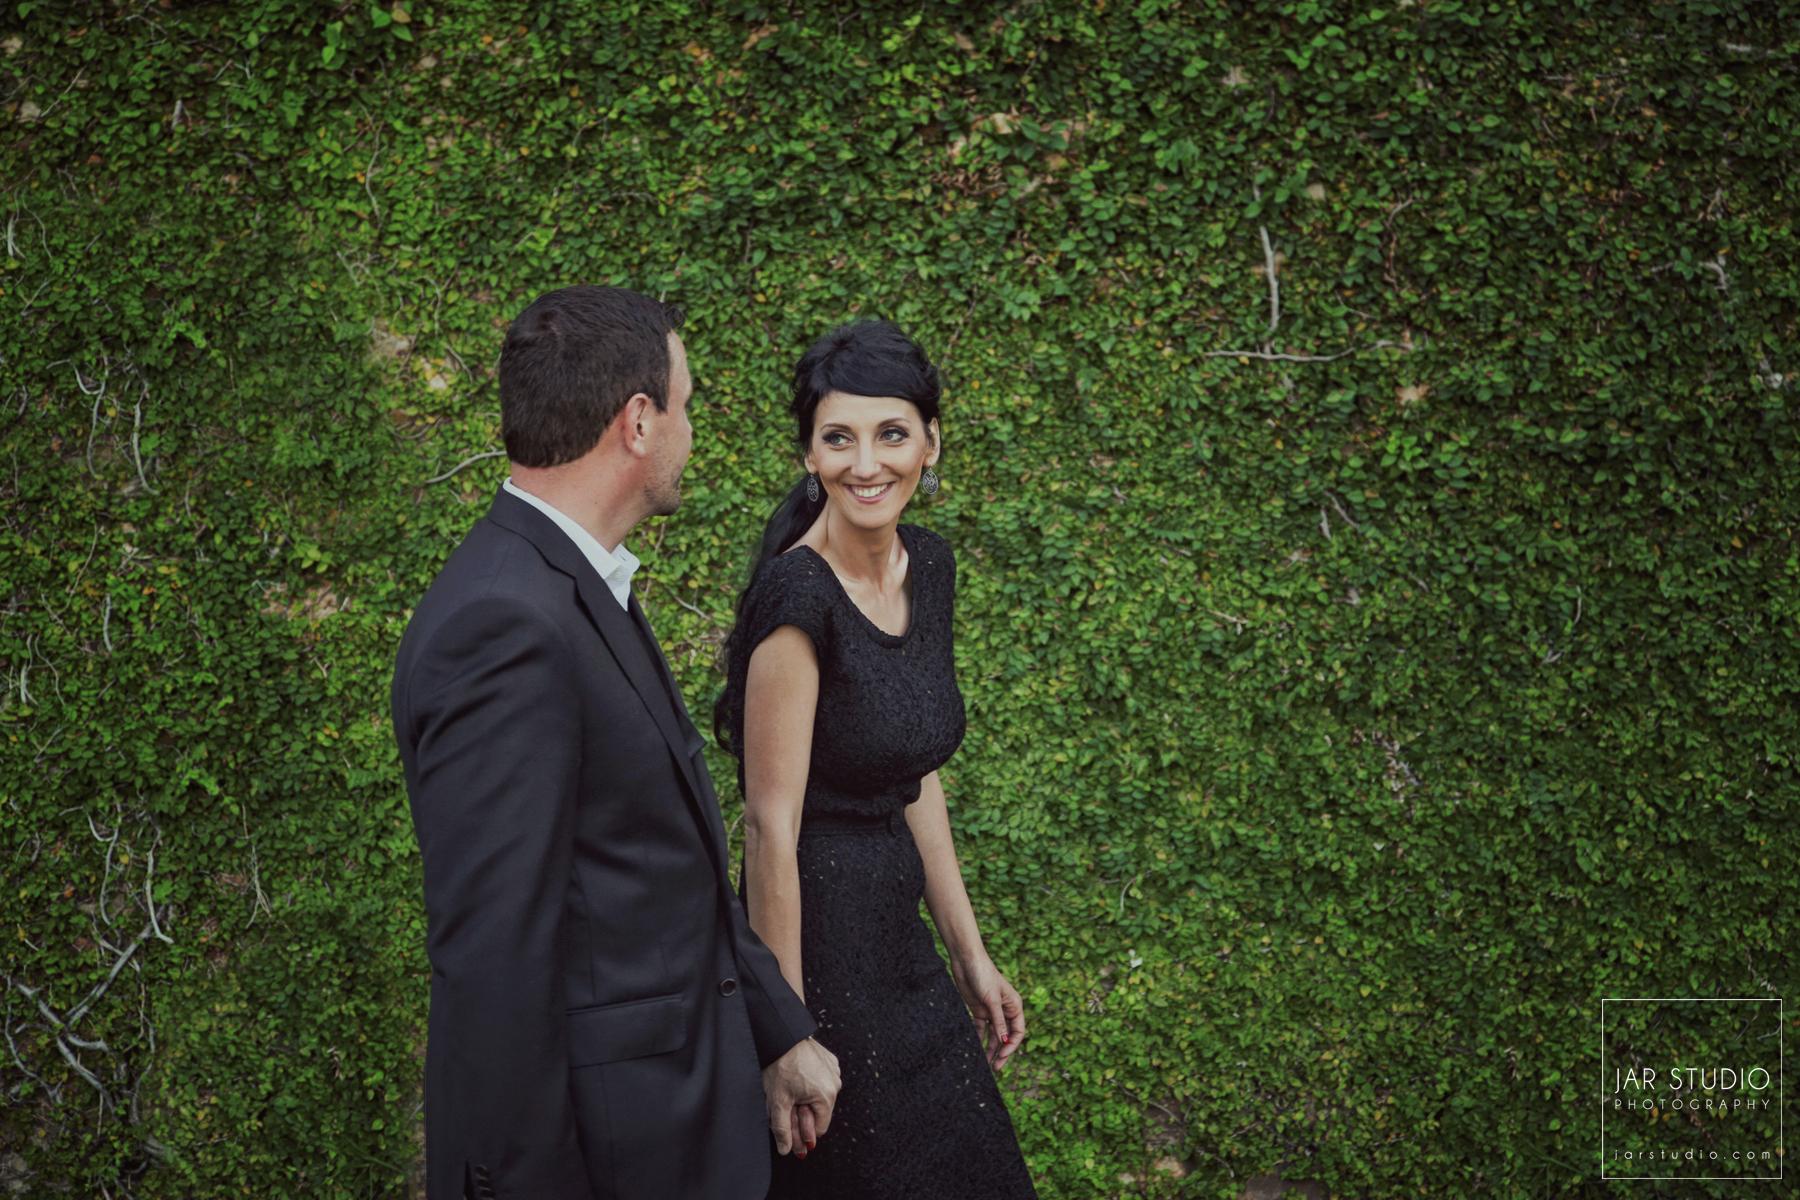 18-bride-to-be-bella-collina-jarstudio-photography.jpg